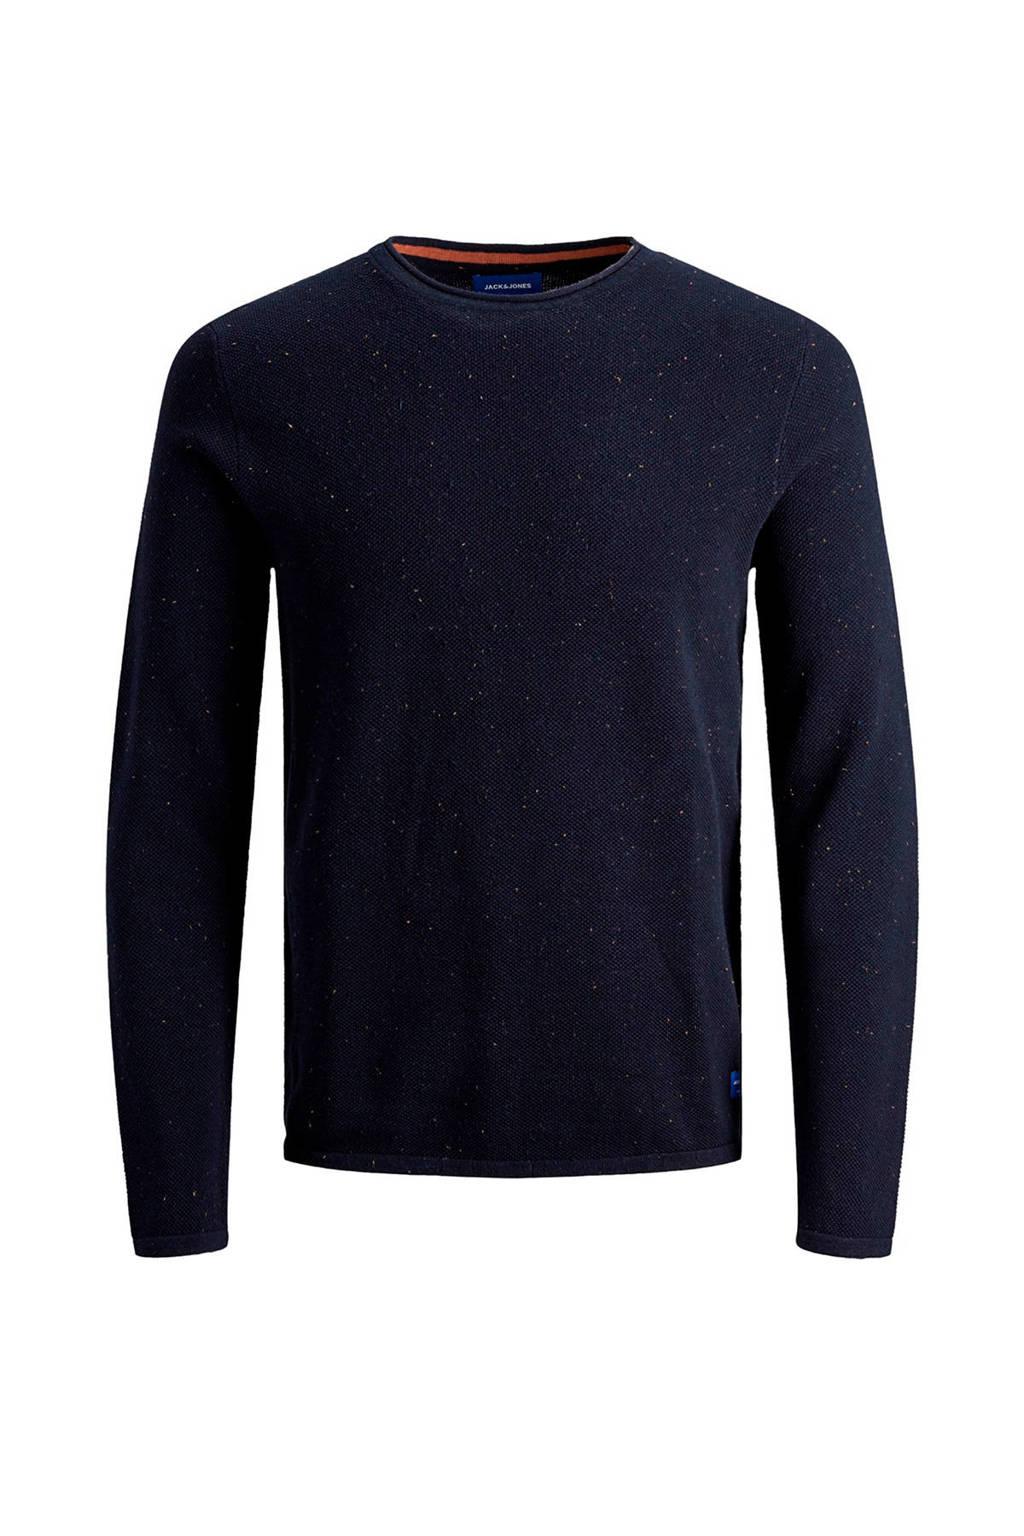 JACK & JONES ORIGINALS trui donkerblauw, Donkerblauw